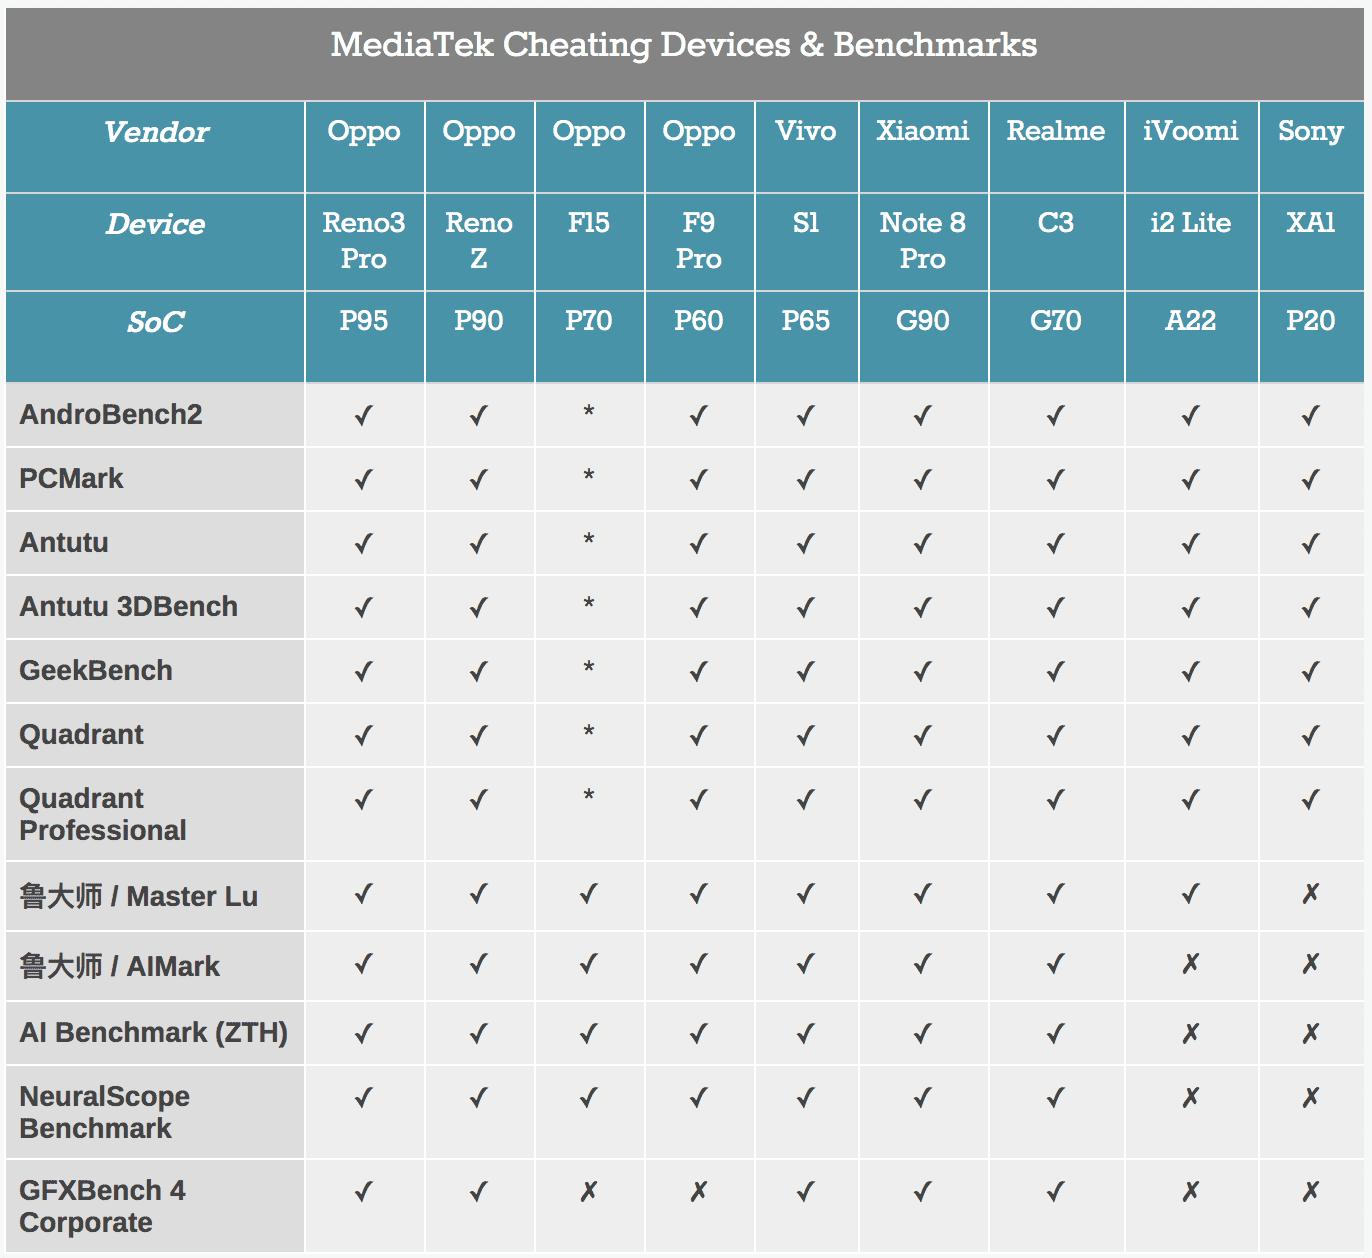 Anche Mediatek beccata a barare nei benchmark